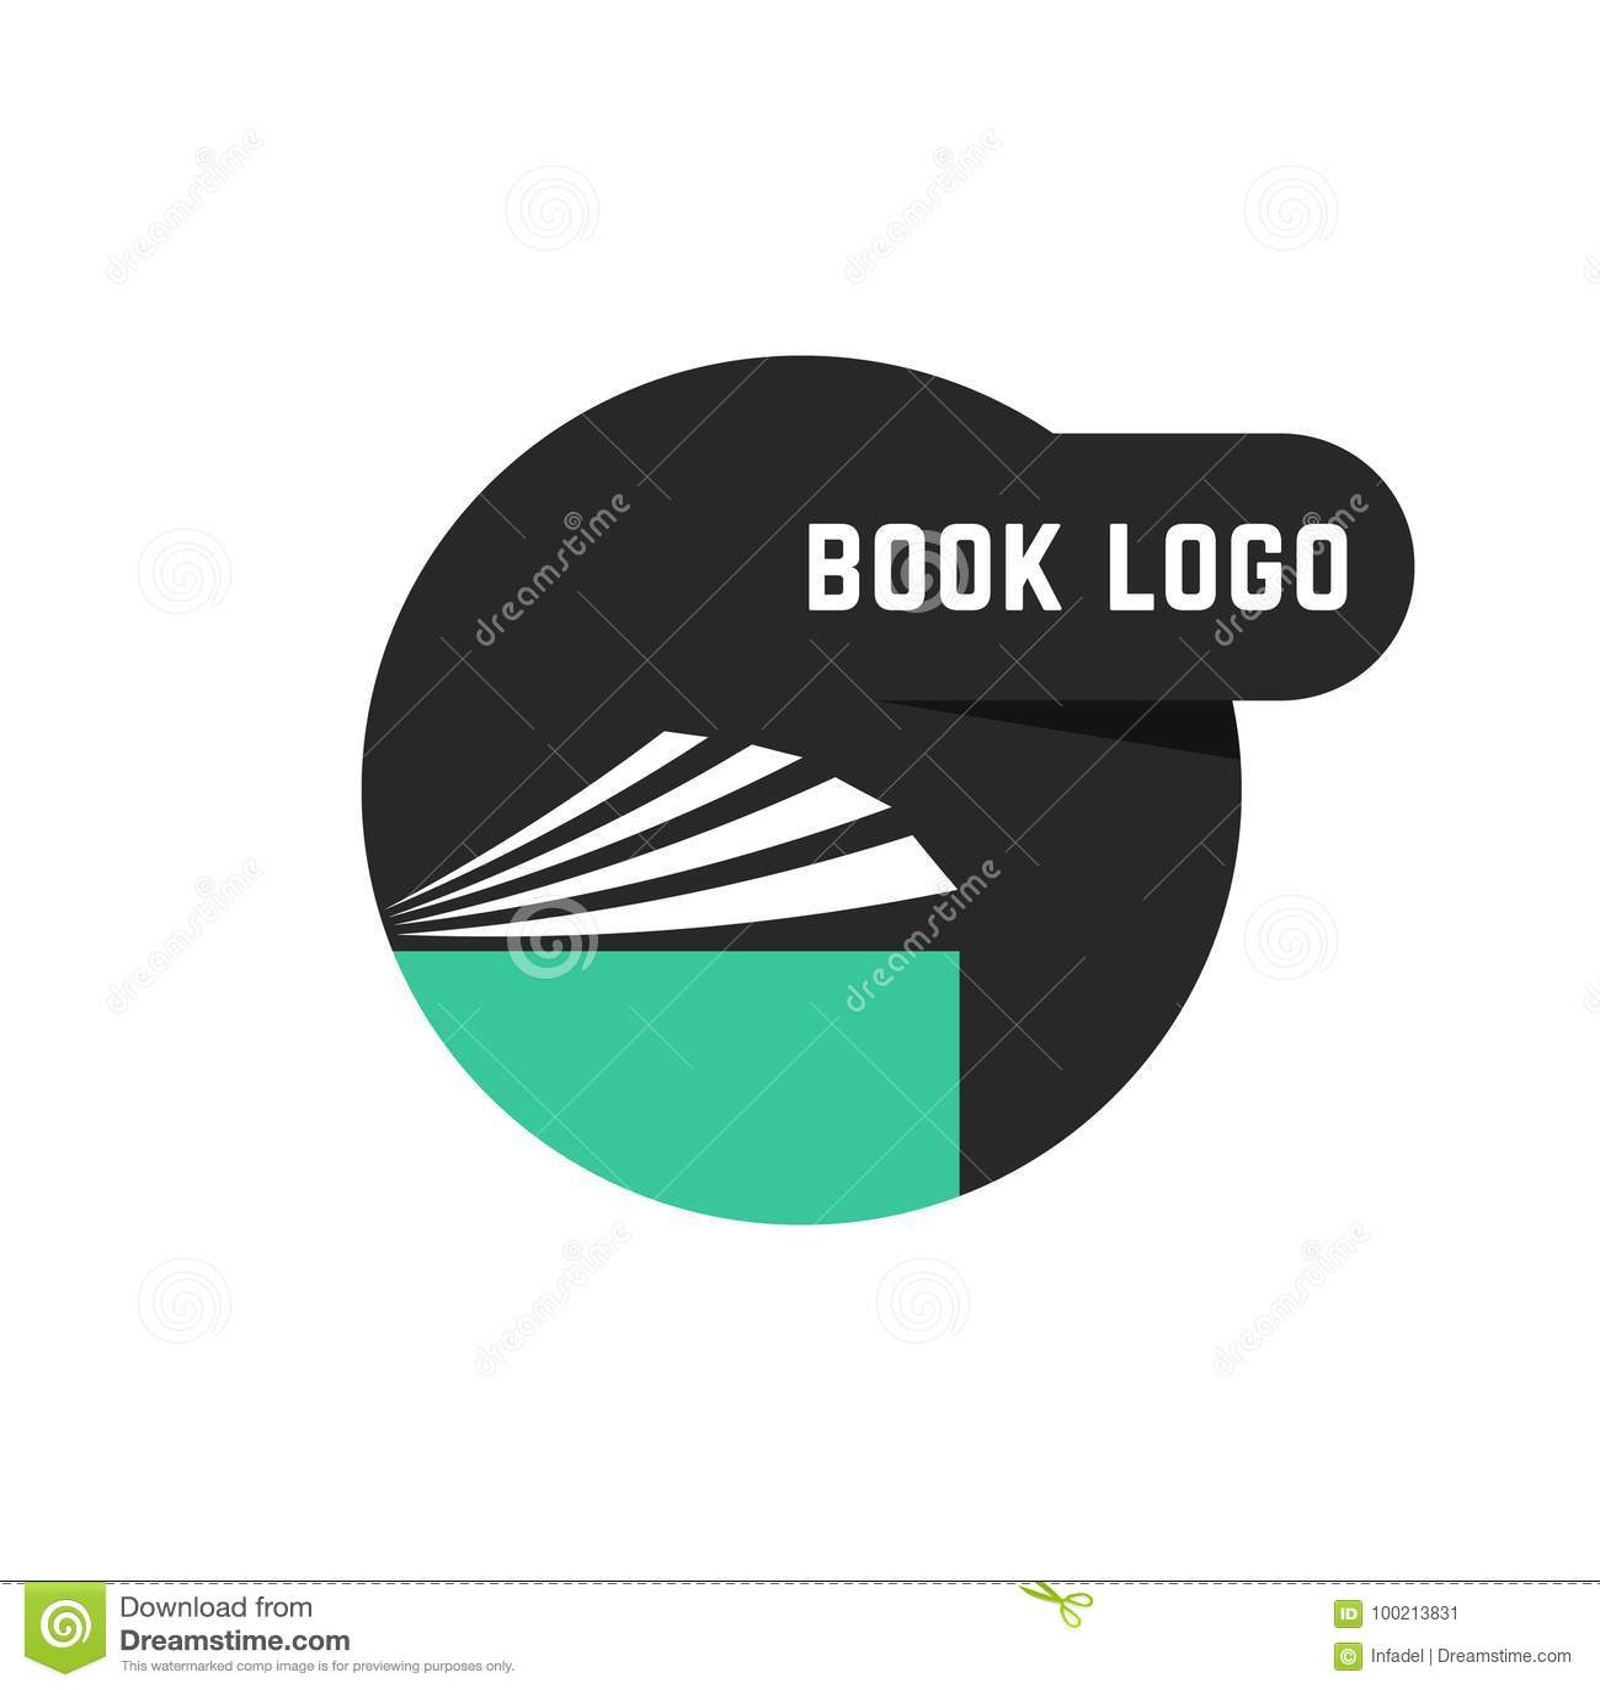 black round book logo stock vector illustration of logo 100213831